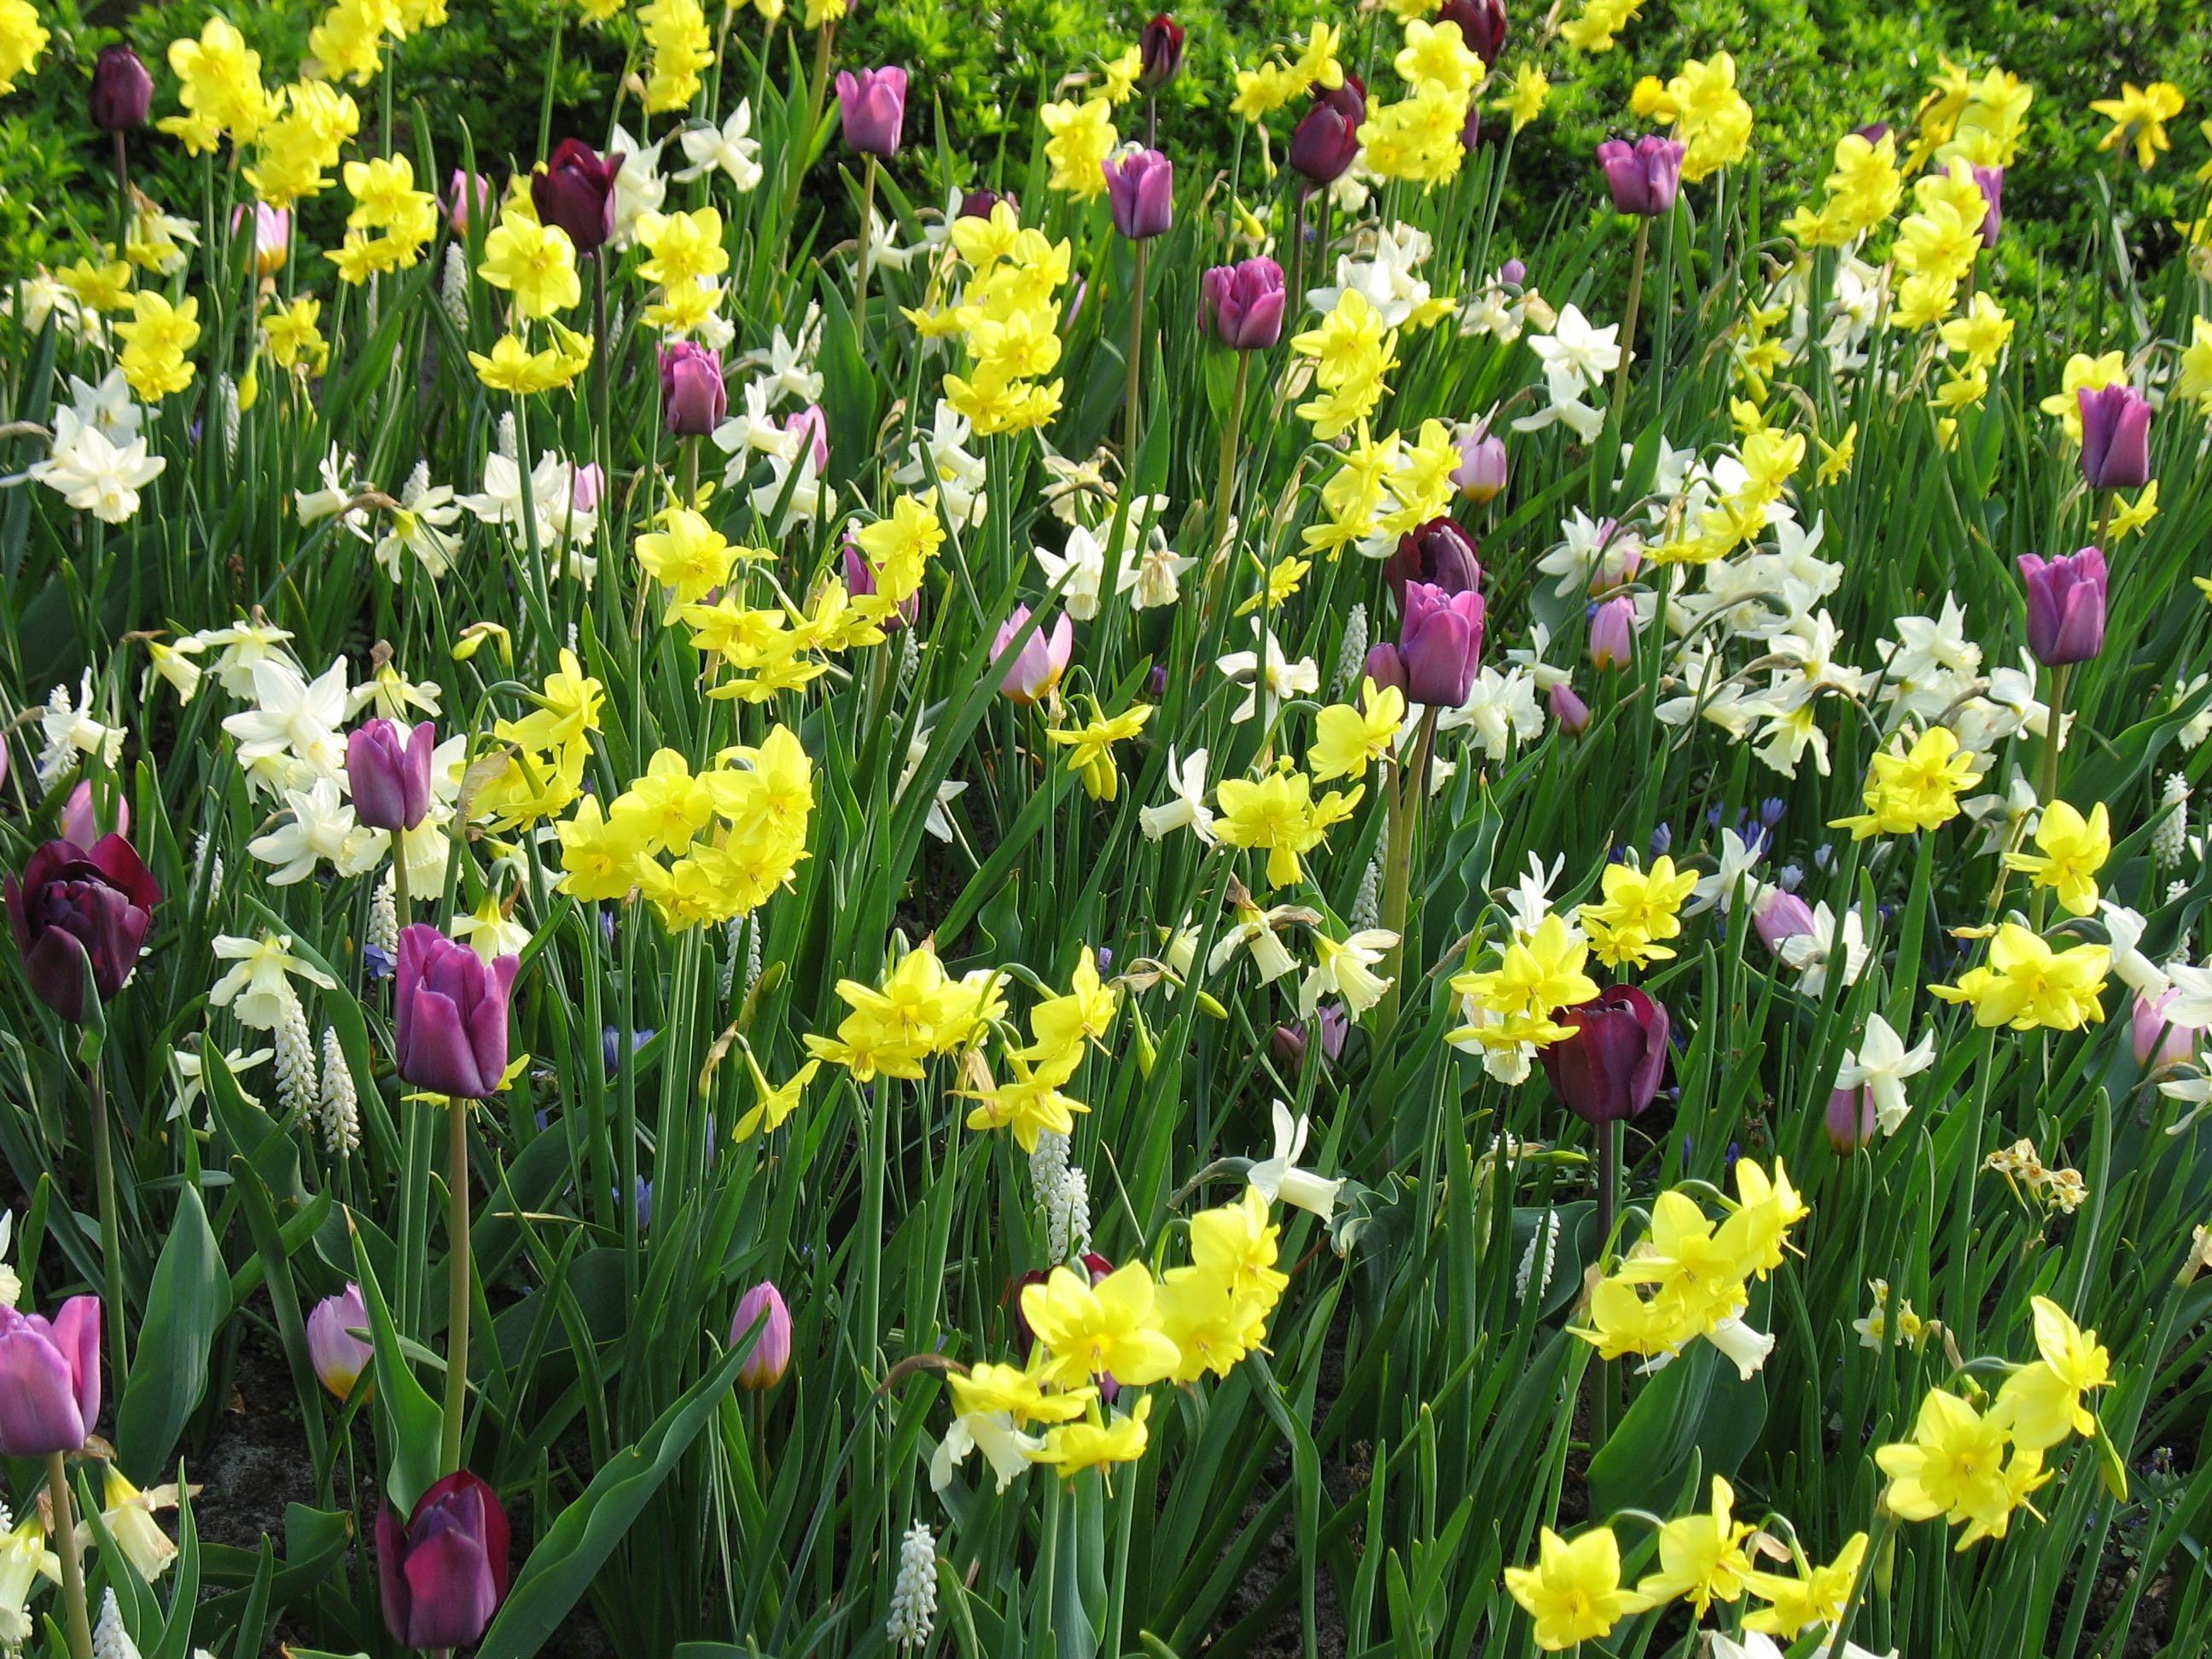 Holland Keukenhof naturalized spring bulbs